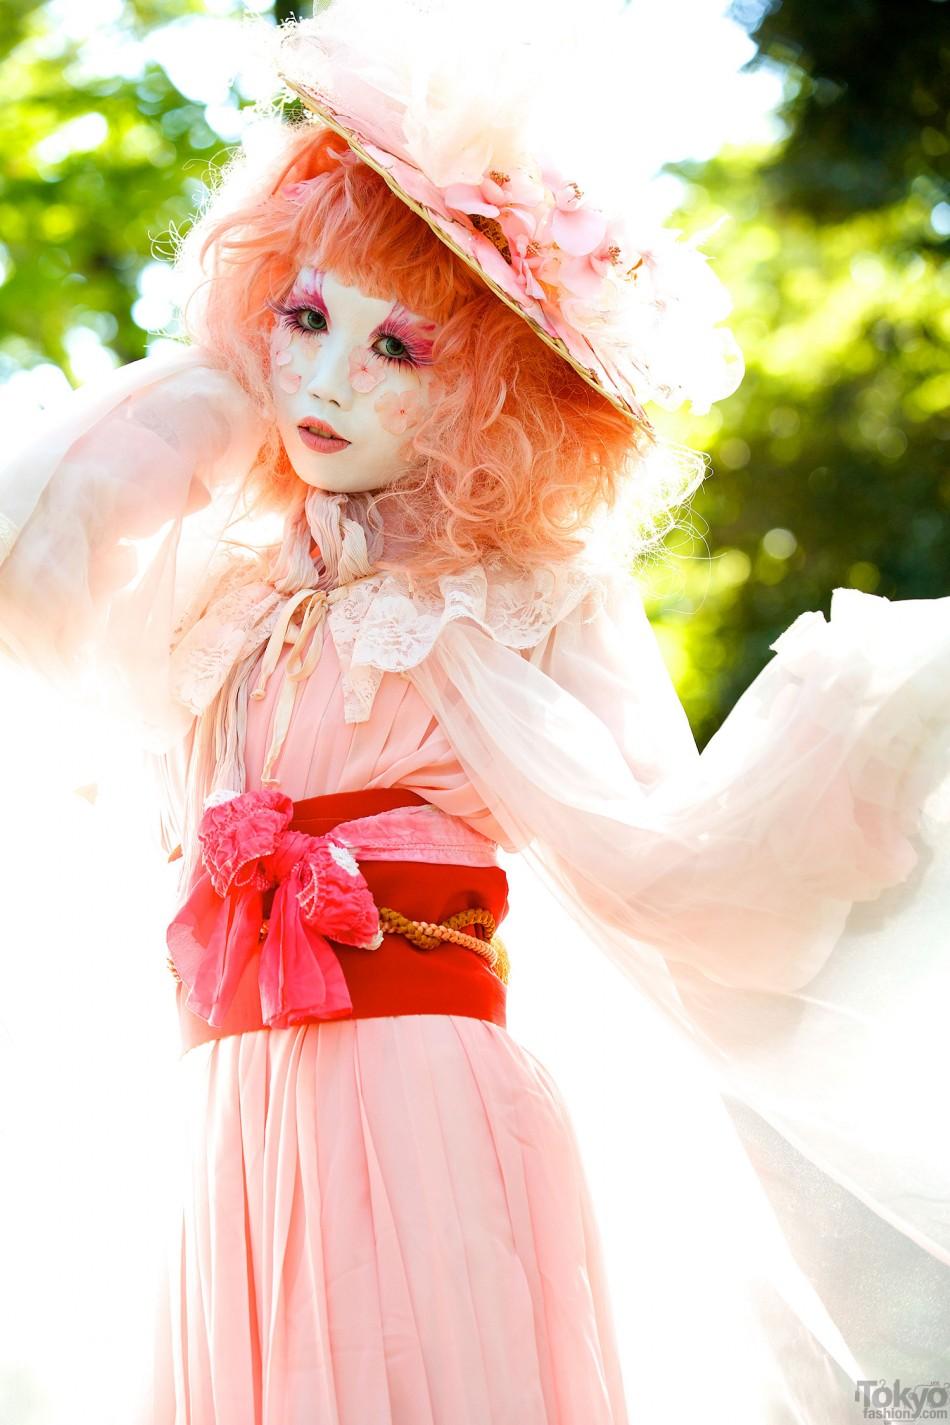 Minori - Her Memories of a Dream (49)